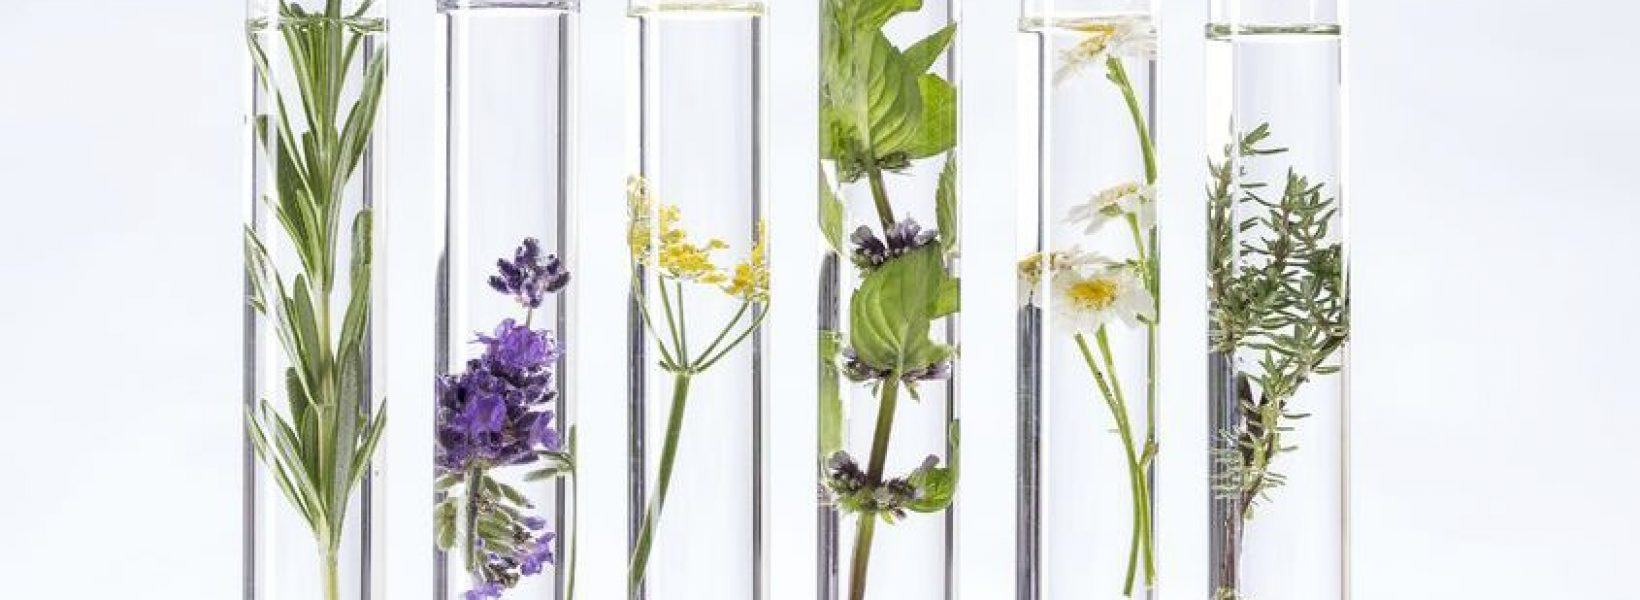 8 alternativas ecológicas y naturales para tu higiene diaria